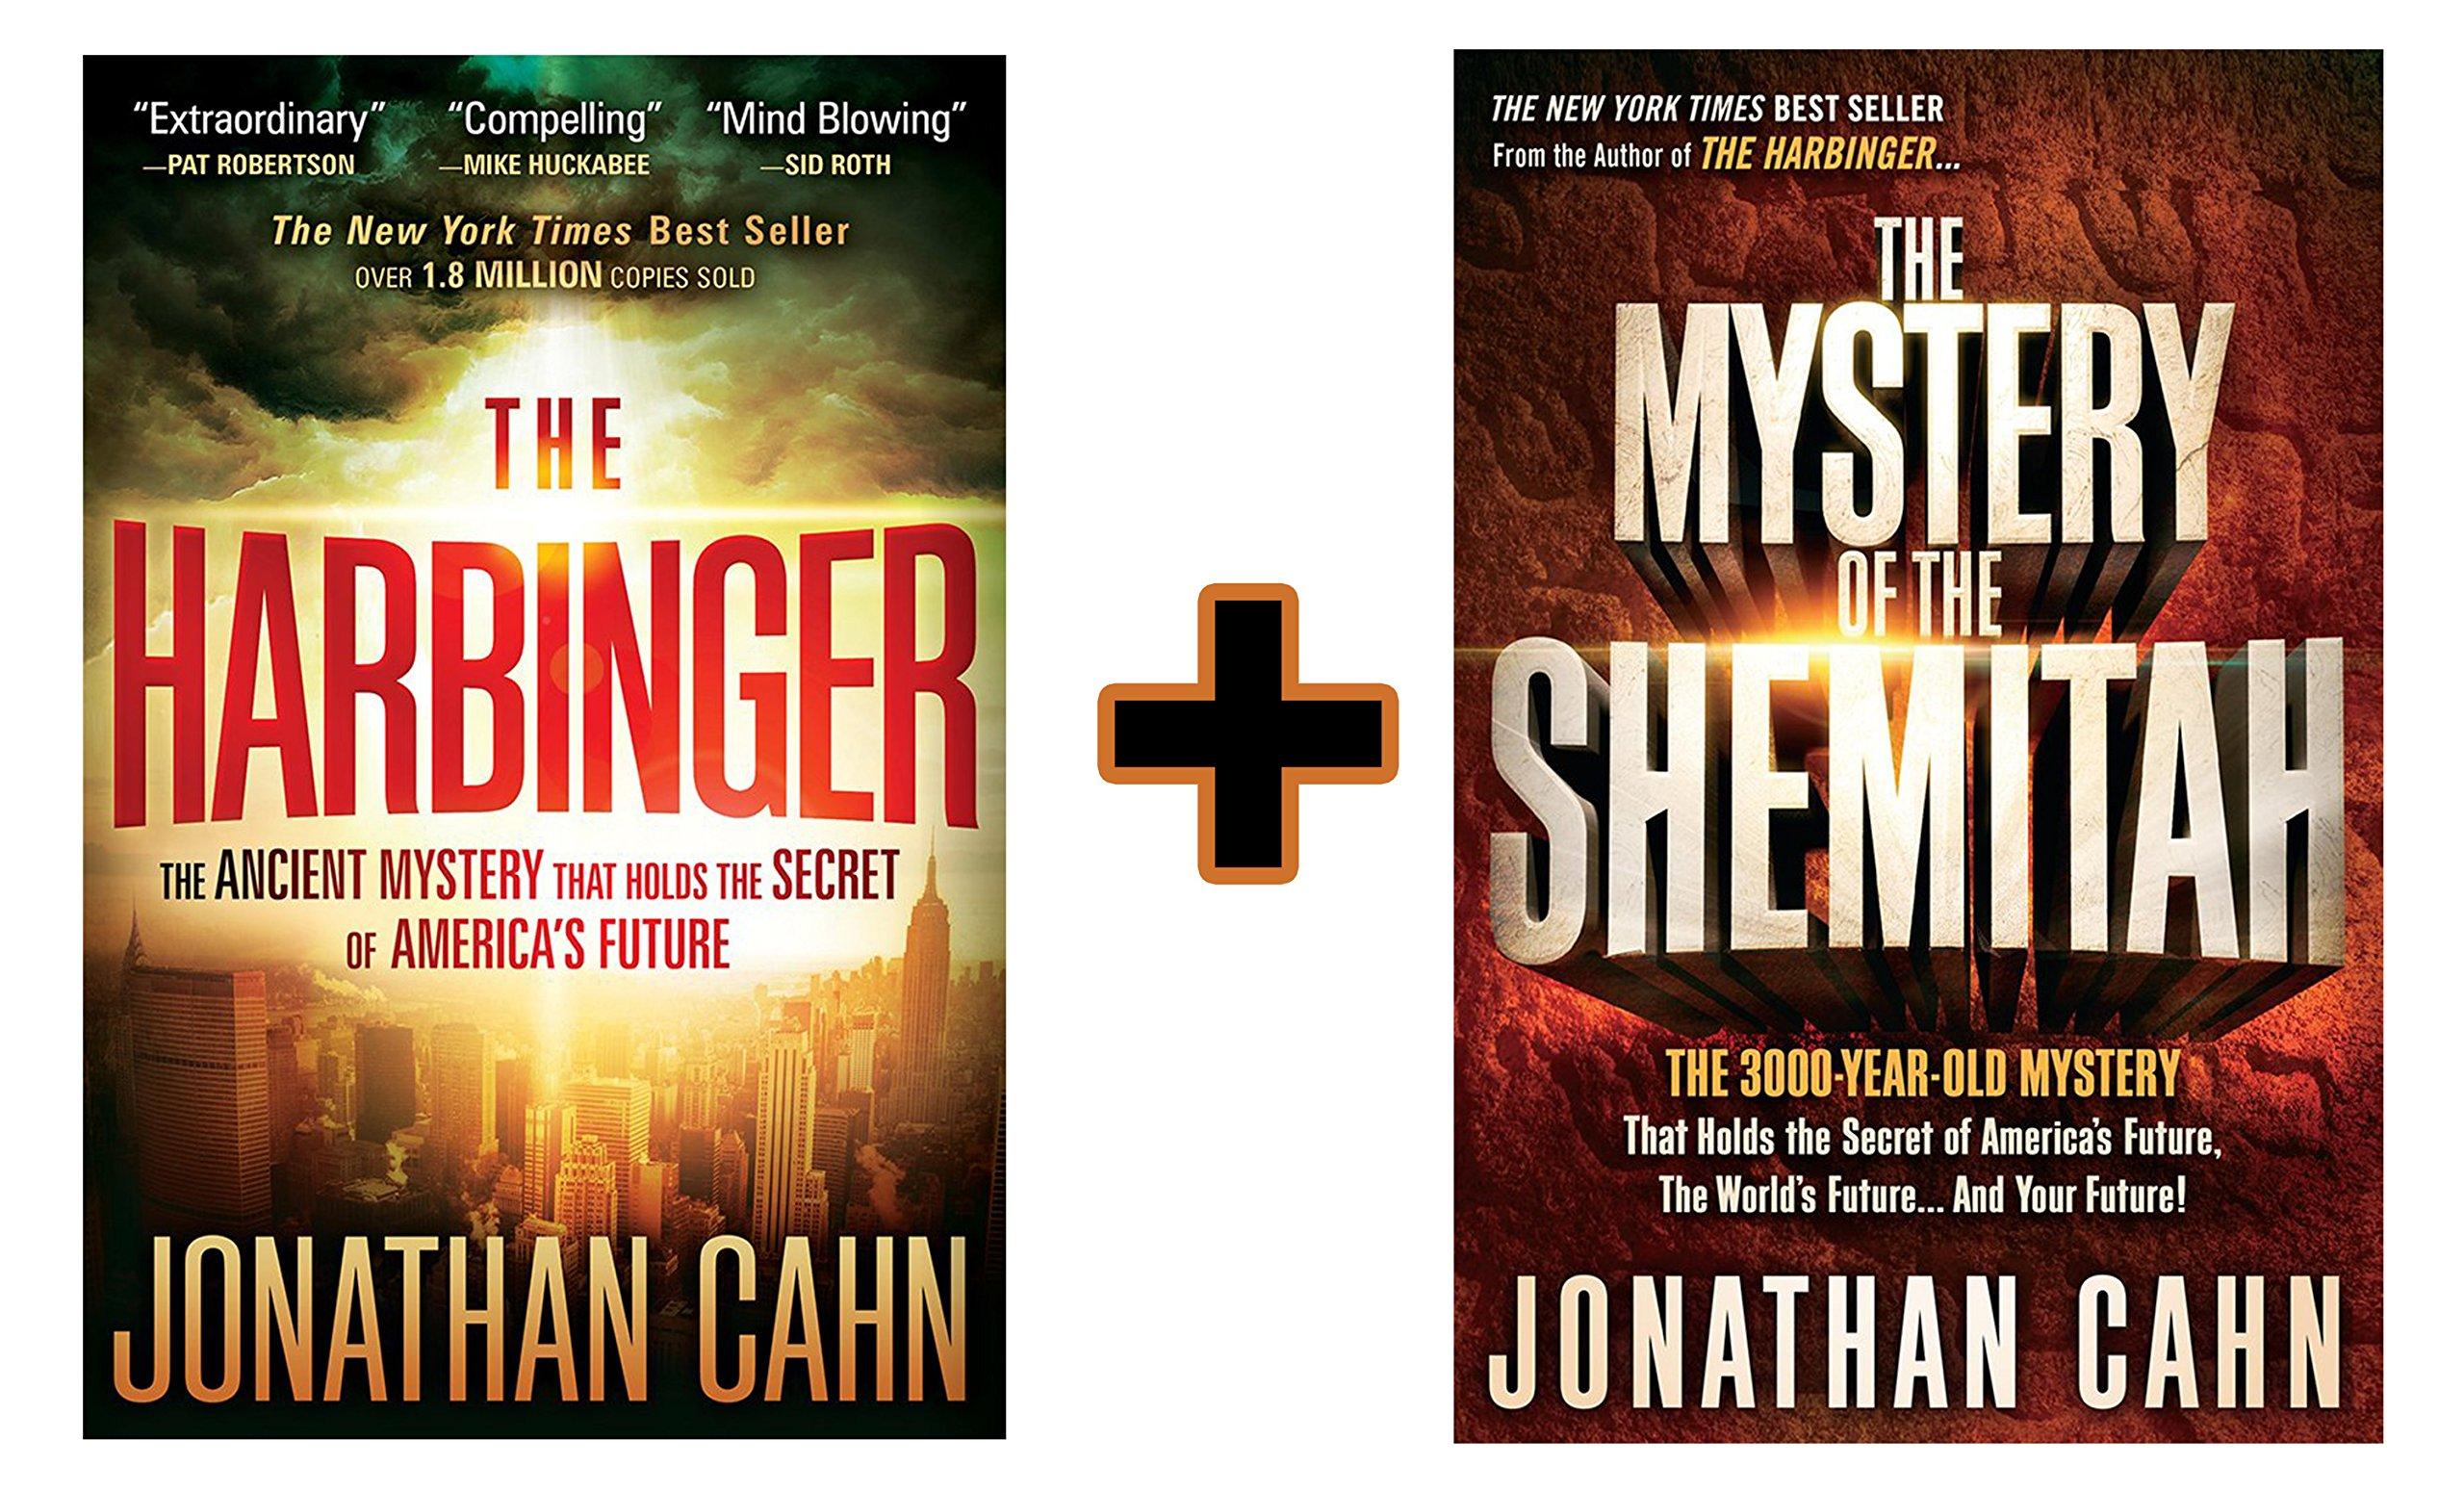 Amazon jonathan cahn books biography blog audiobooks kindle jonathan cahn set the harbinger the mystery of the shemitah by jonathan cahn malvernweather Choice Image